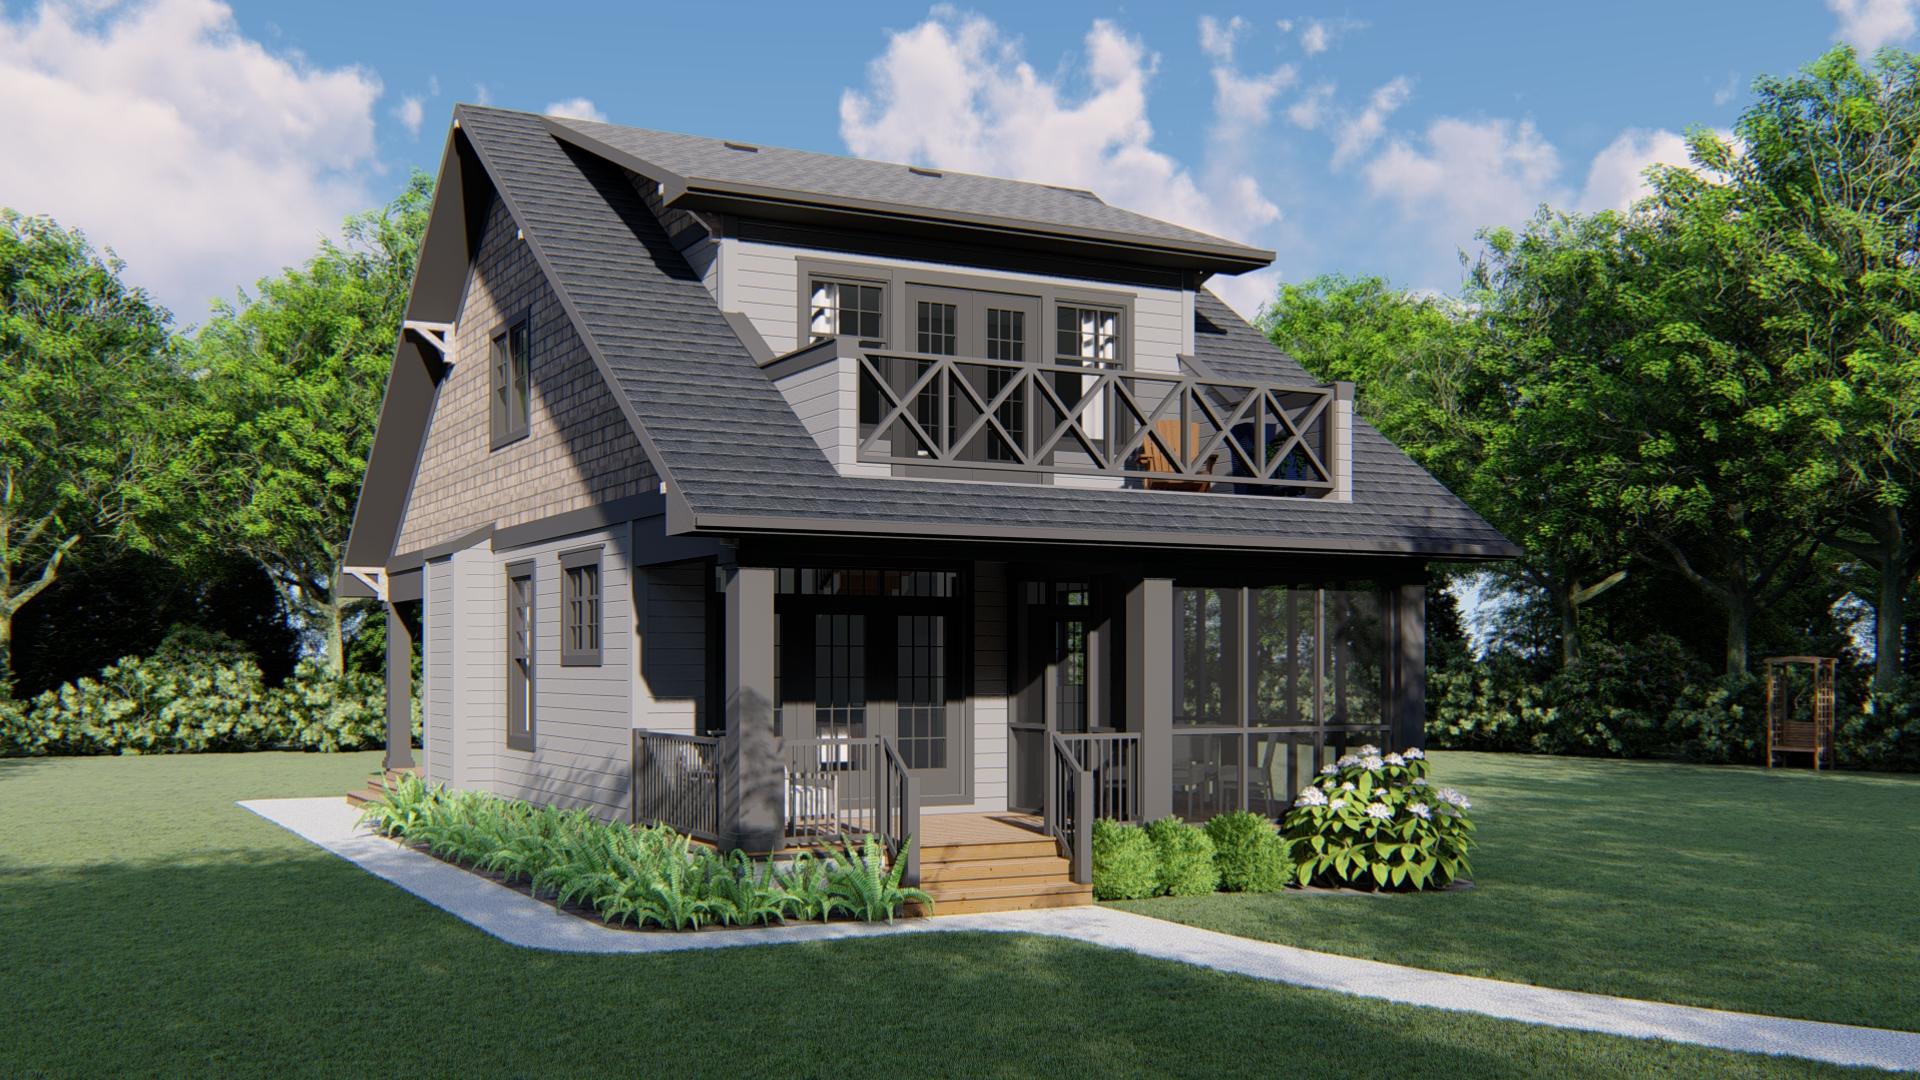 House Plans Craftsman | Craftsman H 1851